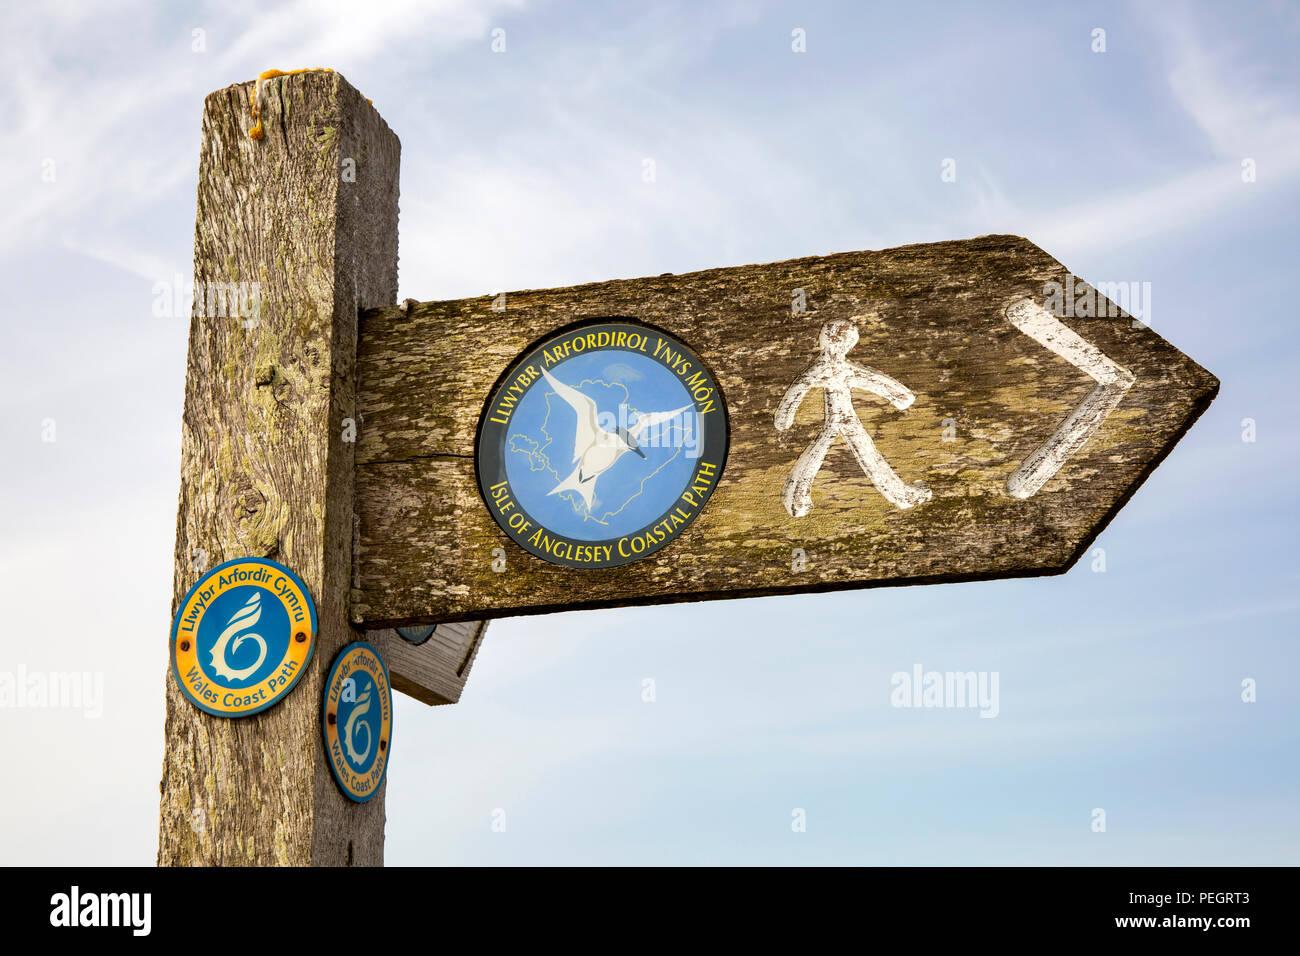 UK, Wales, Anglesey, Trearddur Bay, Isle of Anglesey Coastal Path signpost - Stock Image